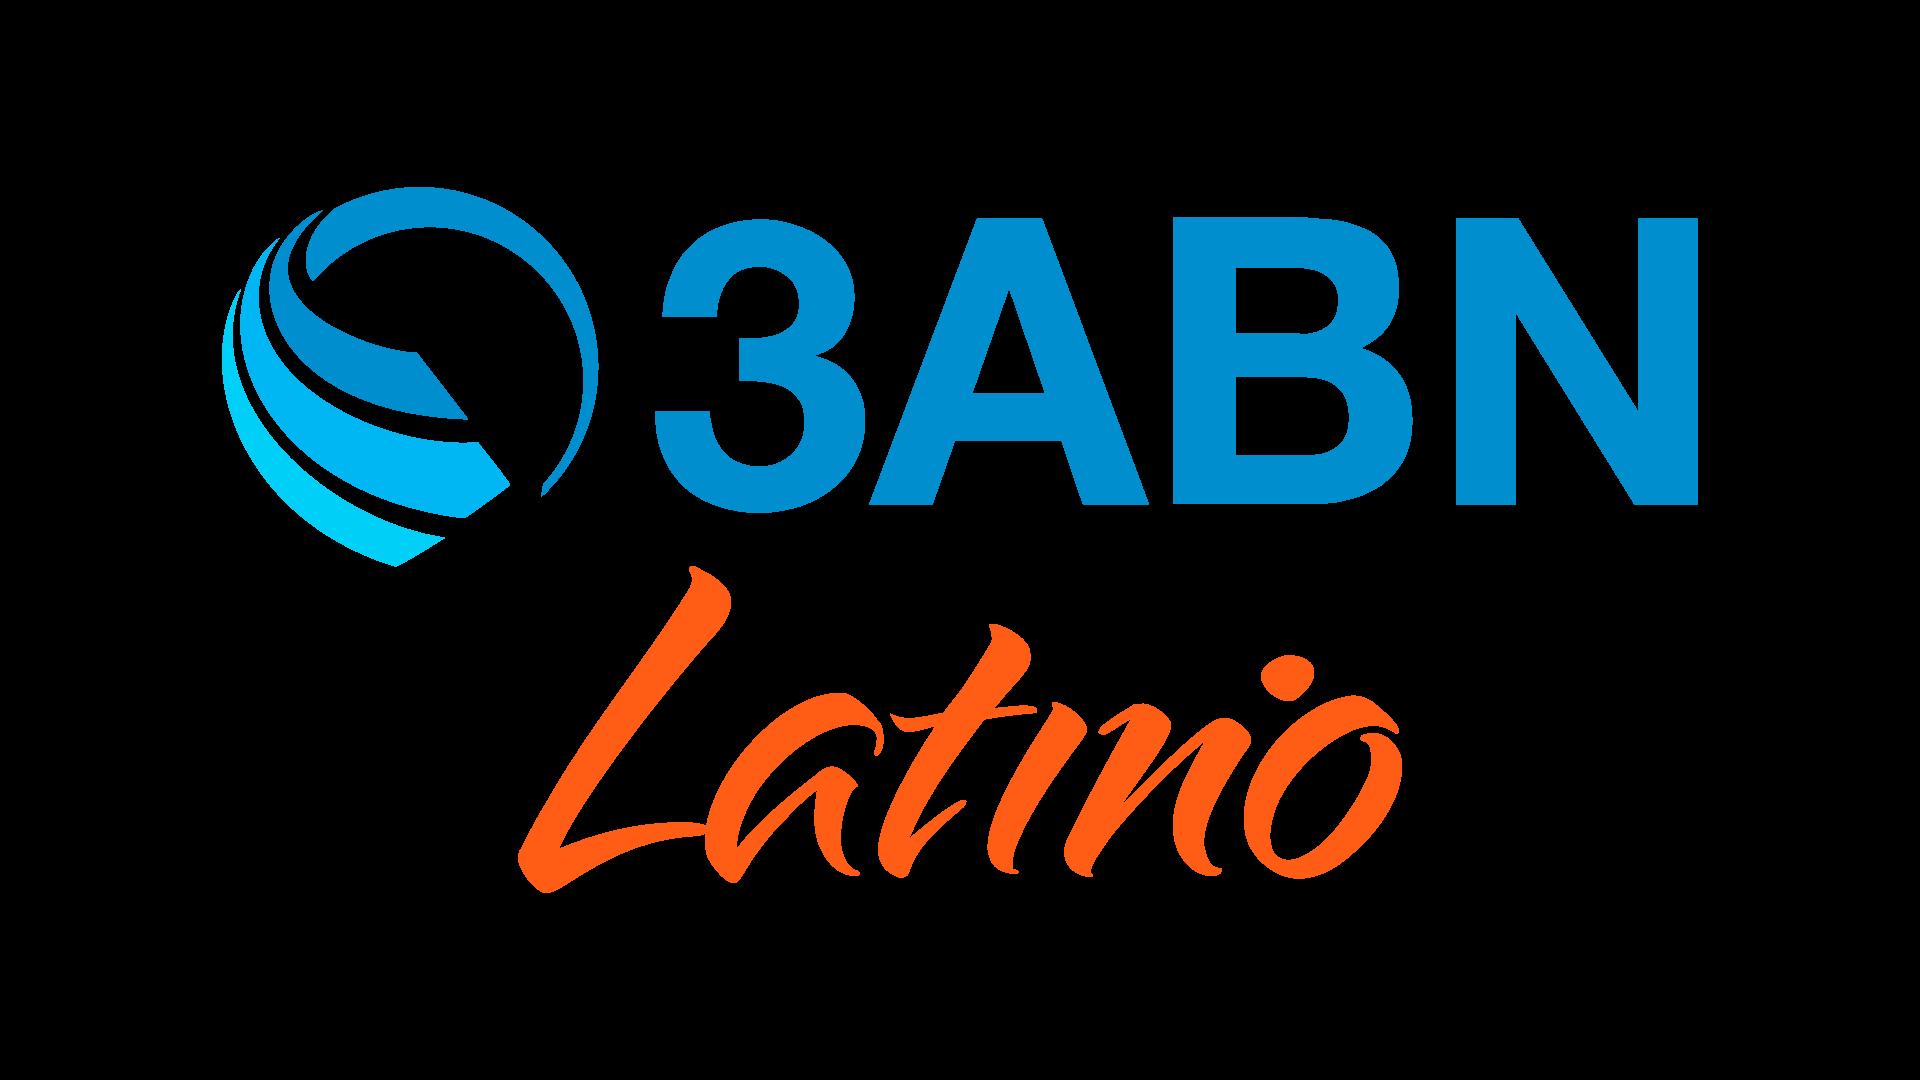 3ABN Latino en directo, Online